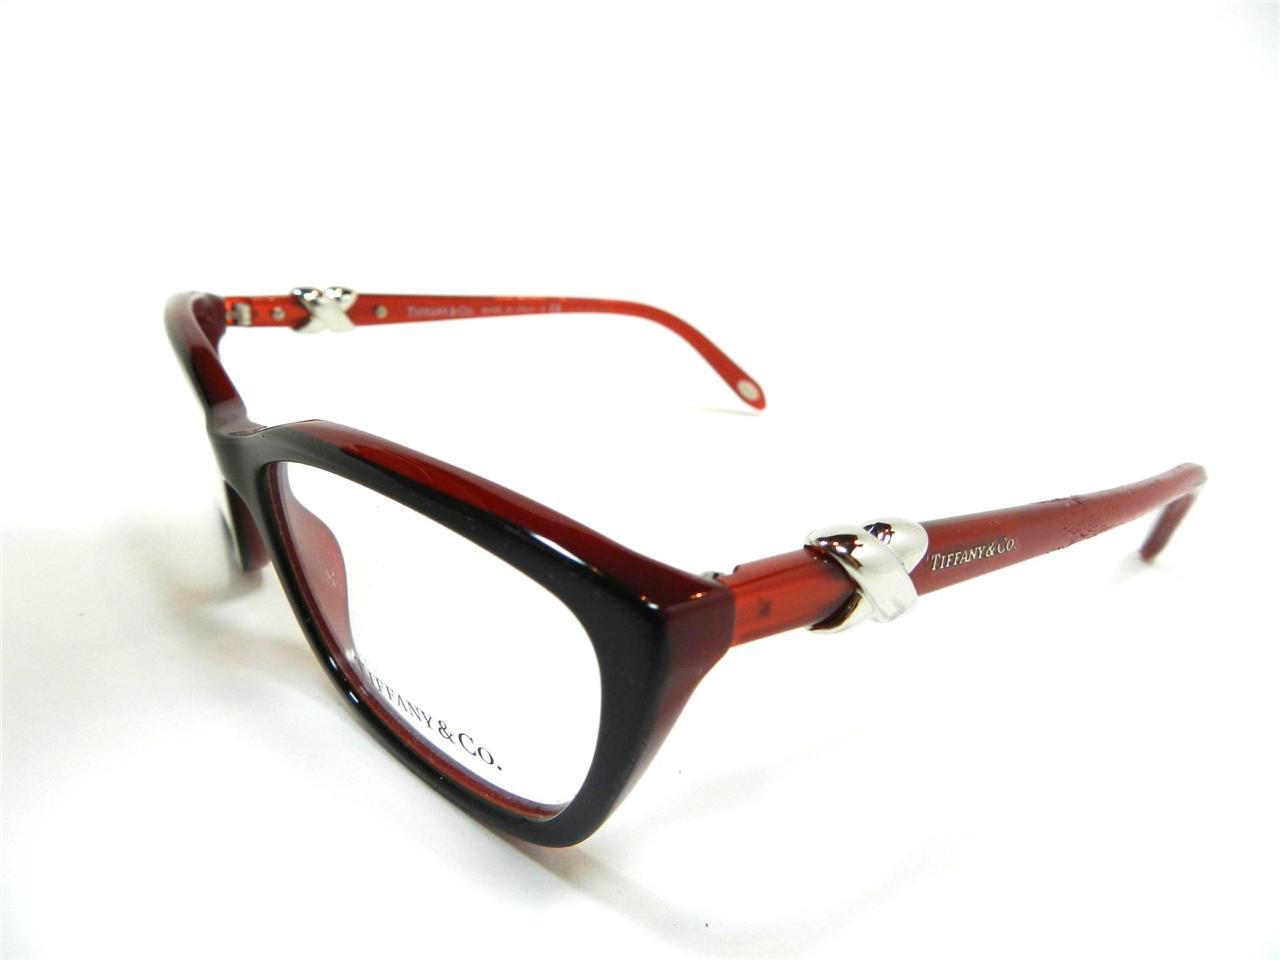 Tiffany Eyeglass Frames : TIFFANY & CO. EYEGLASSES 2074 8156 OPTICAL FRAME NEW AUTHENTIC